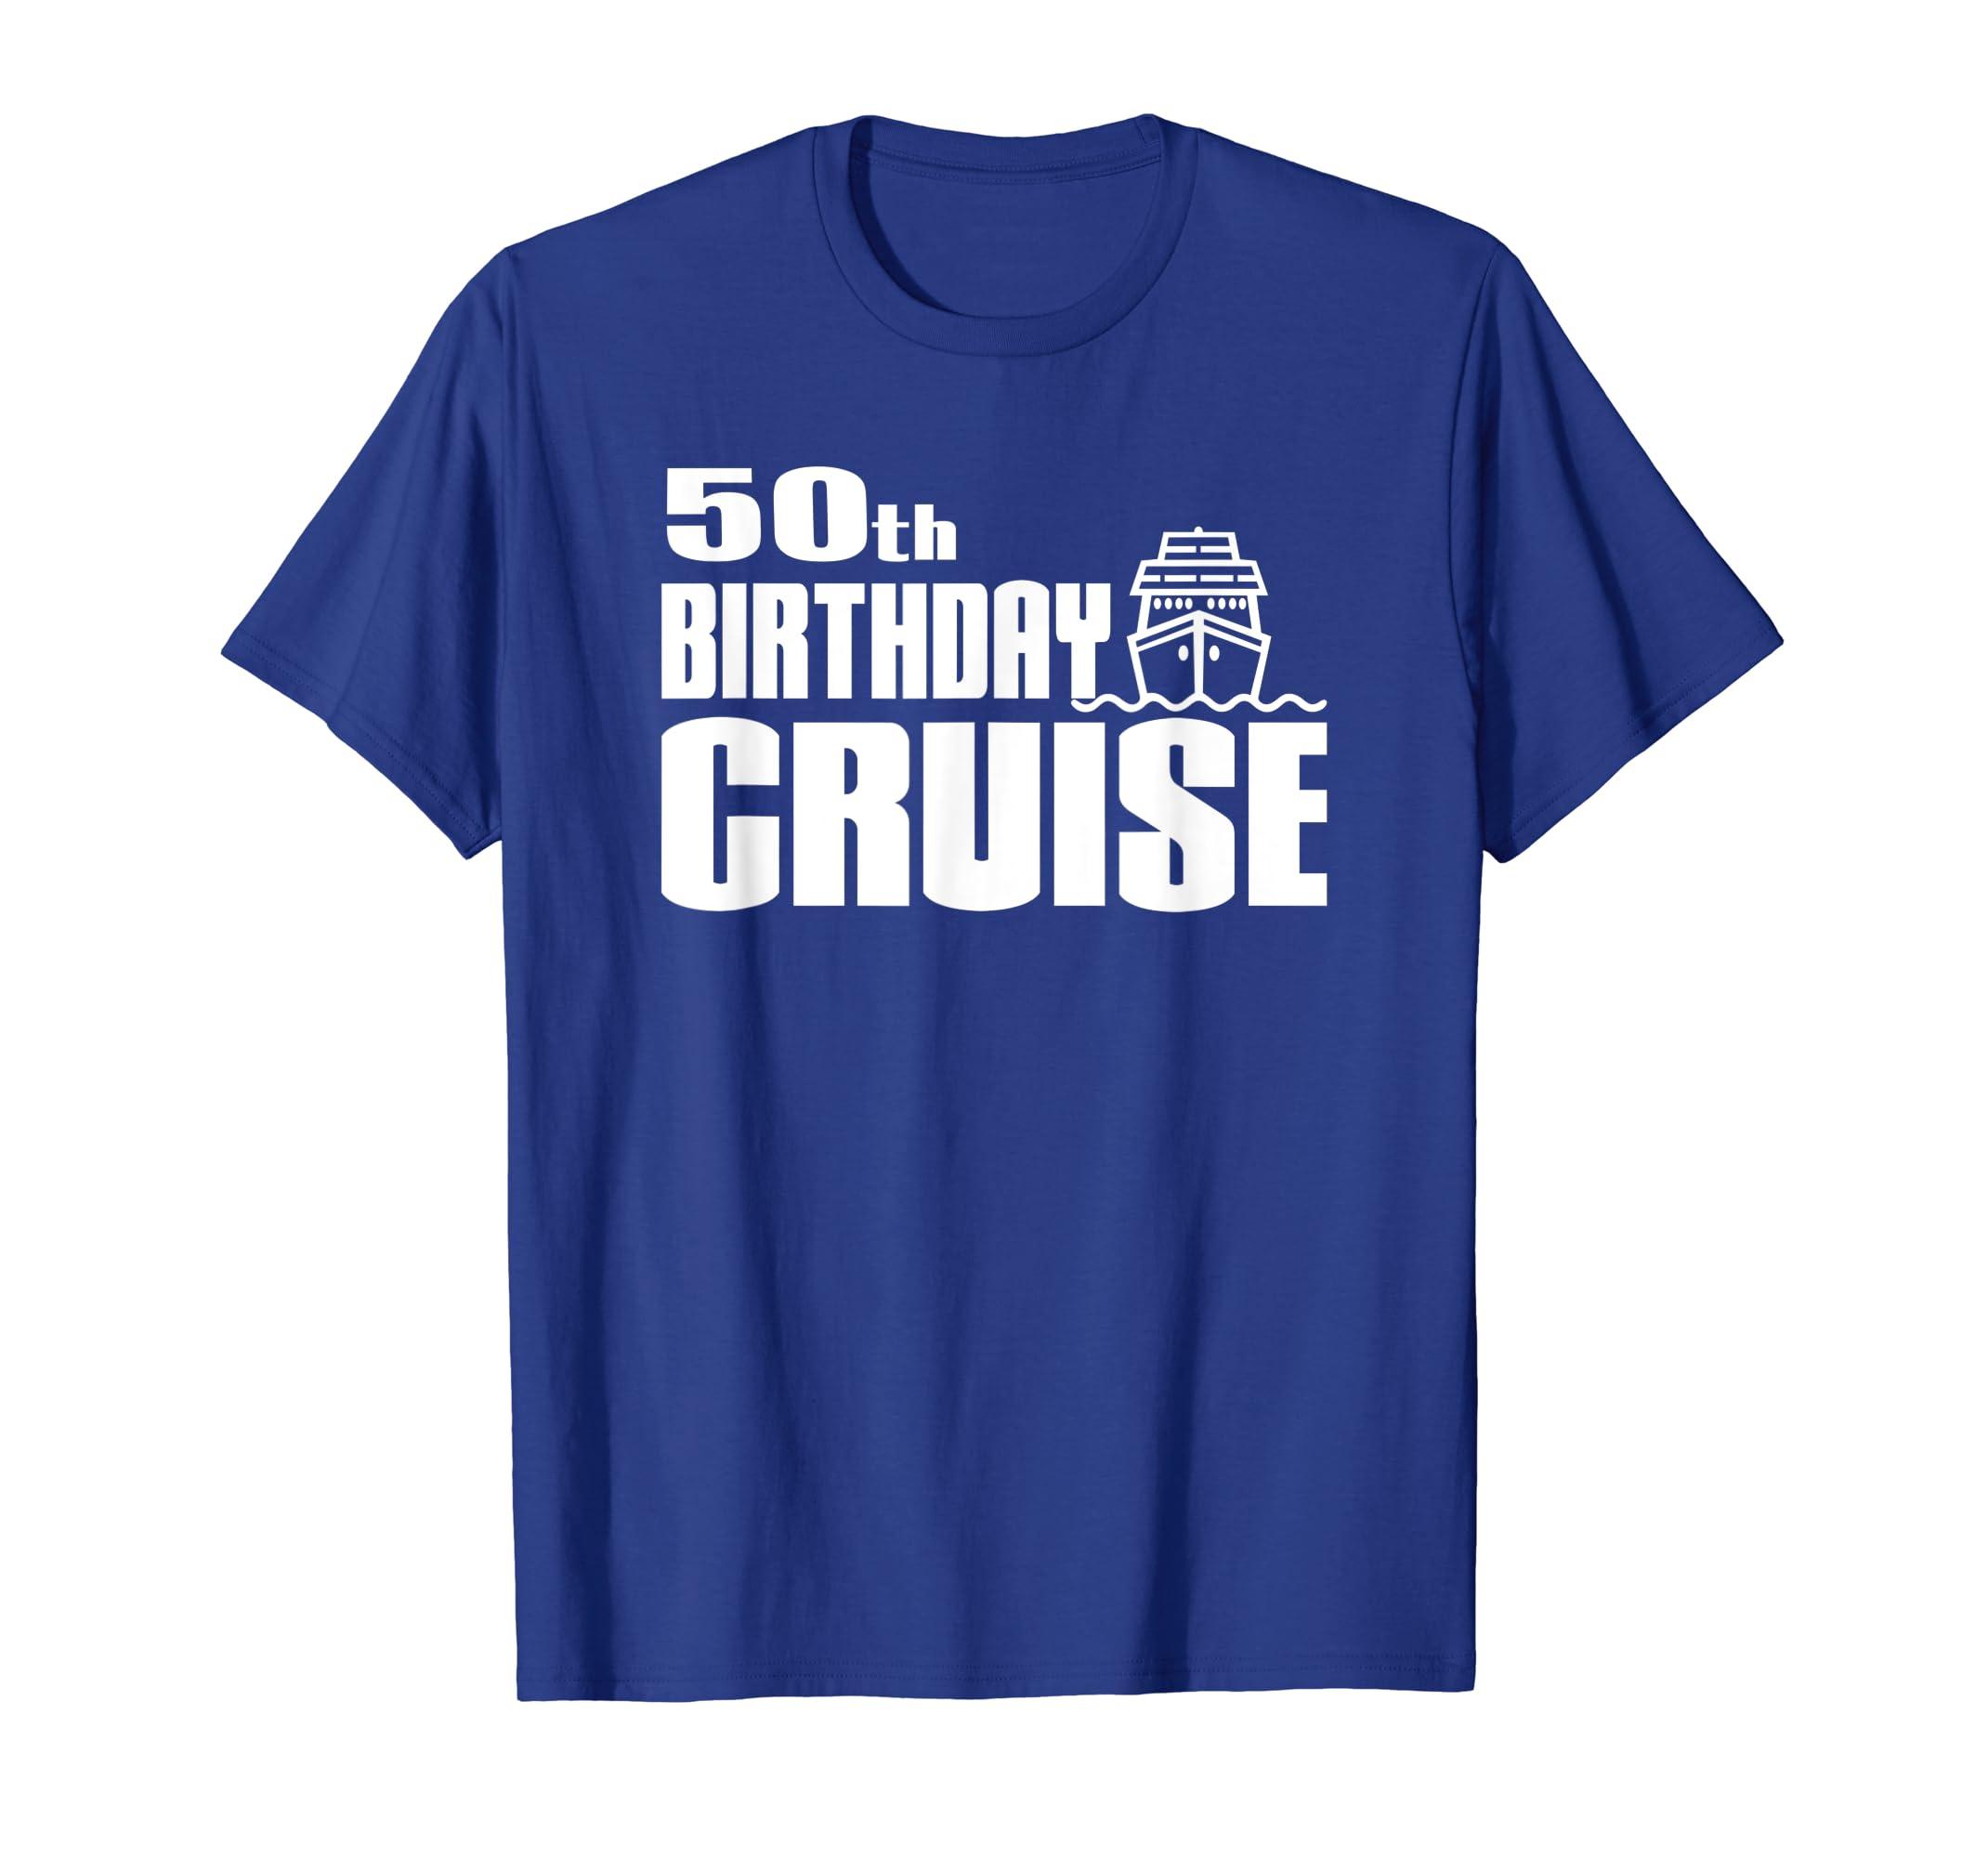 50th Birthday Cruise Ship Celebration Party Shirt